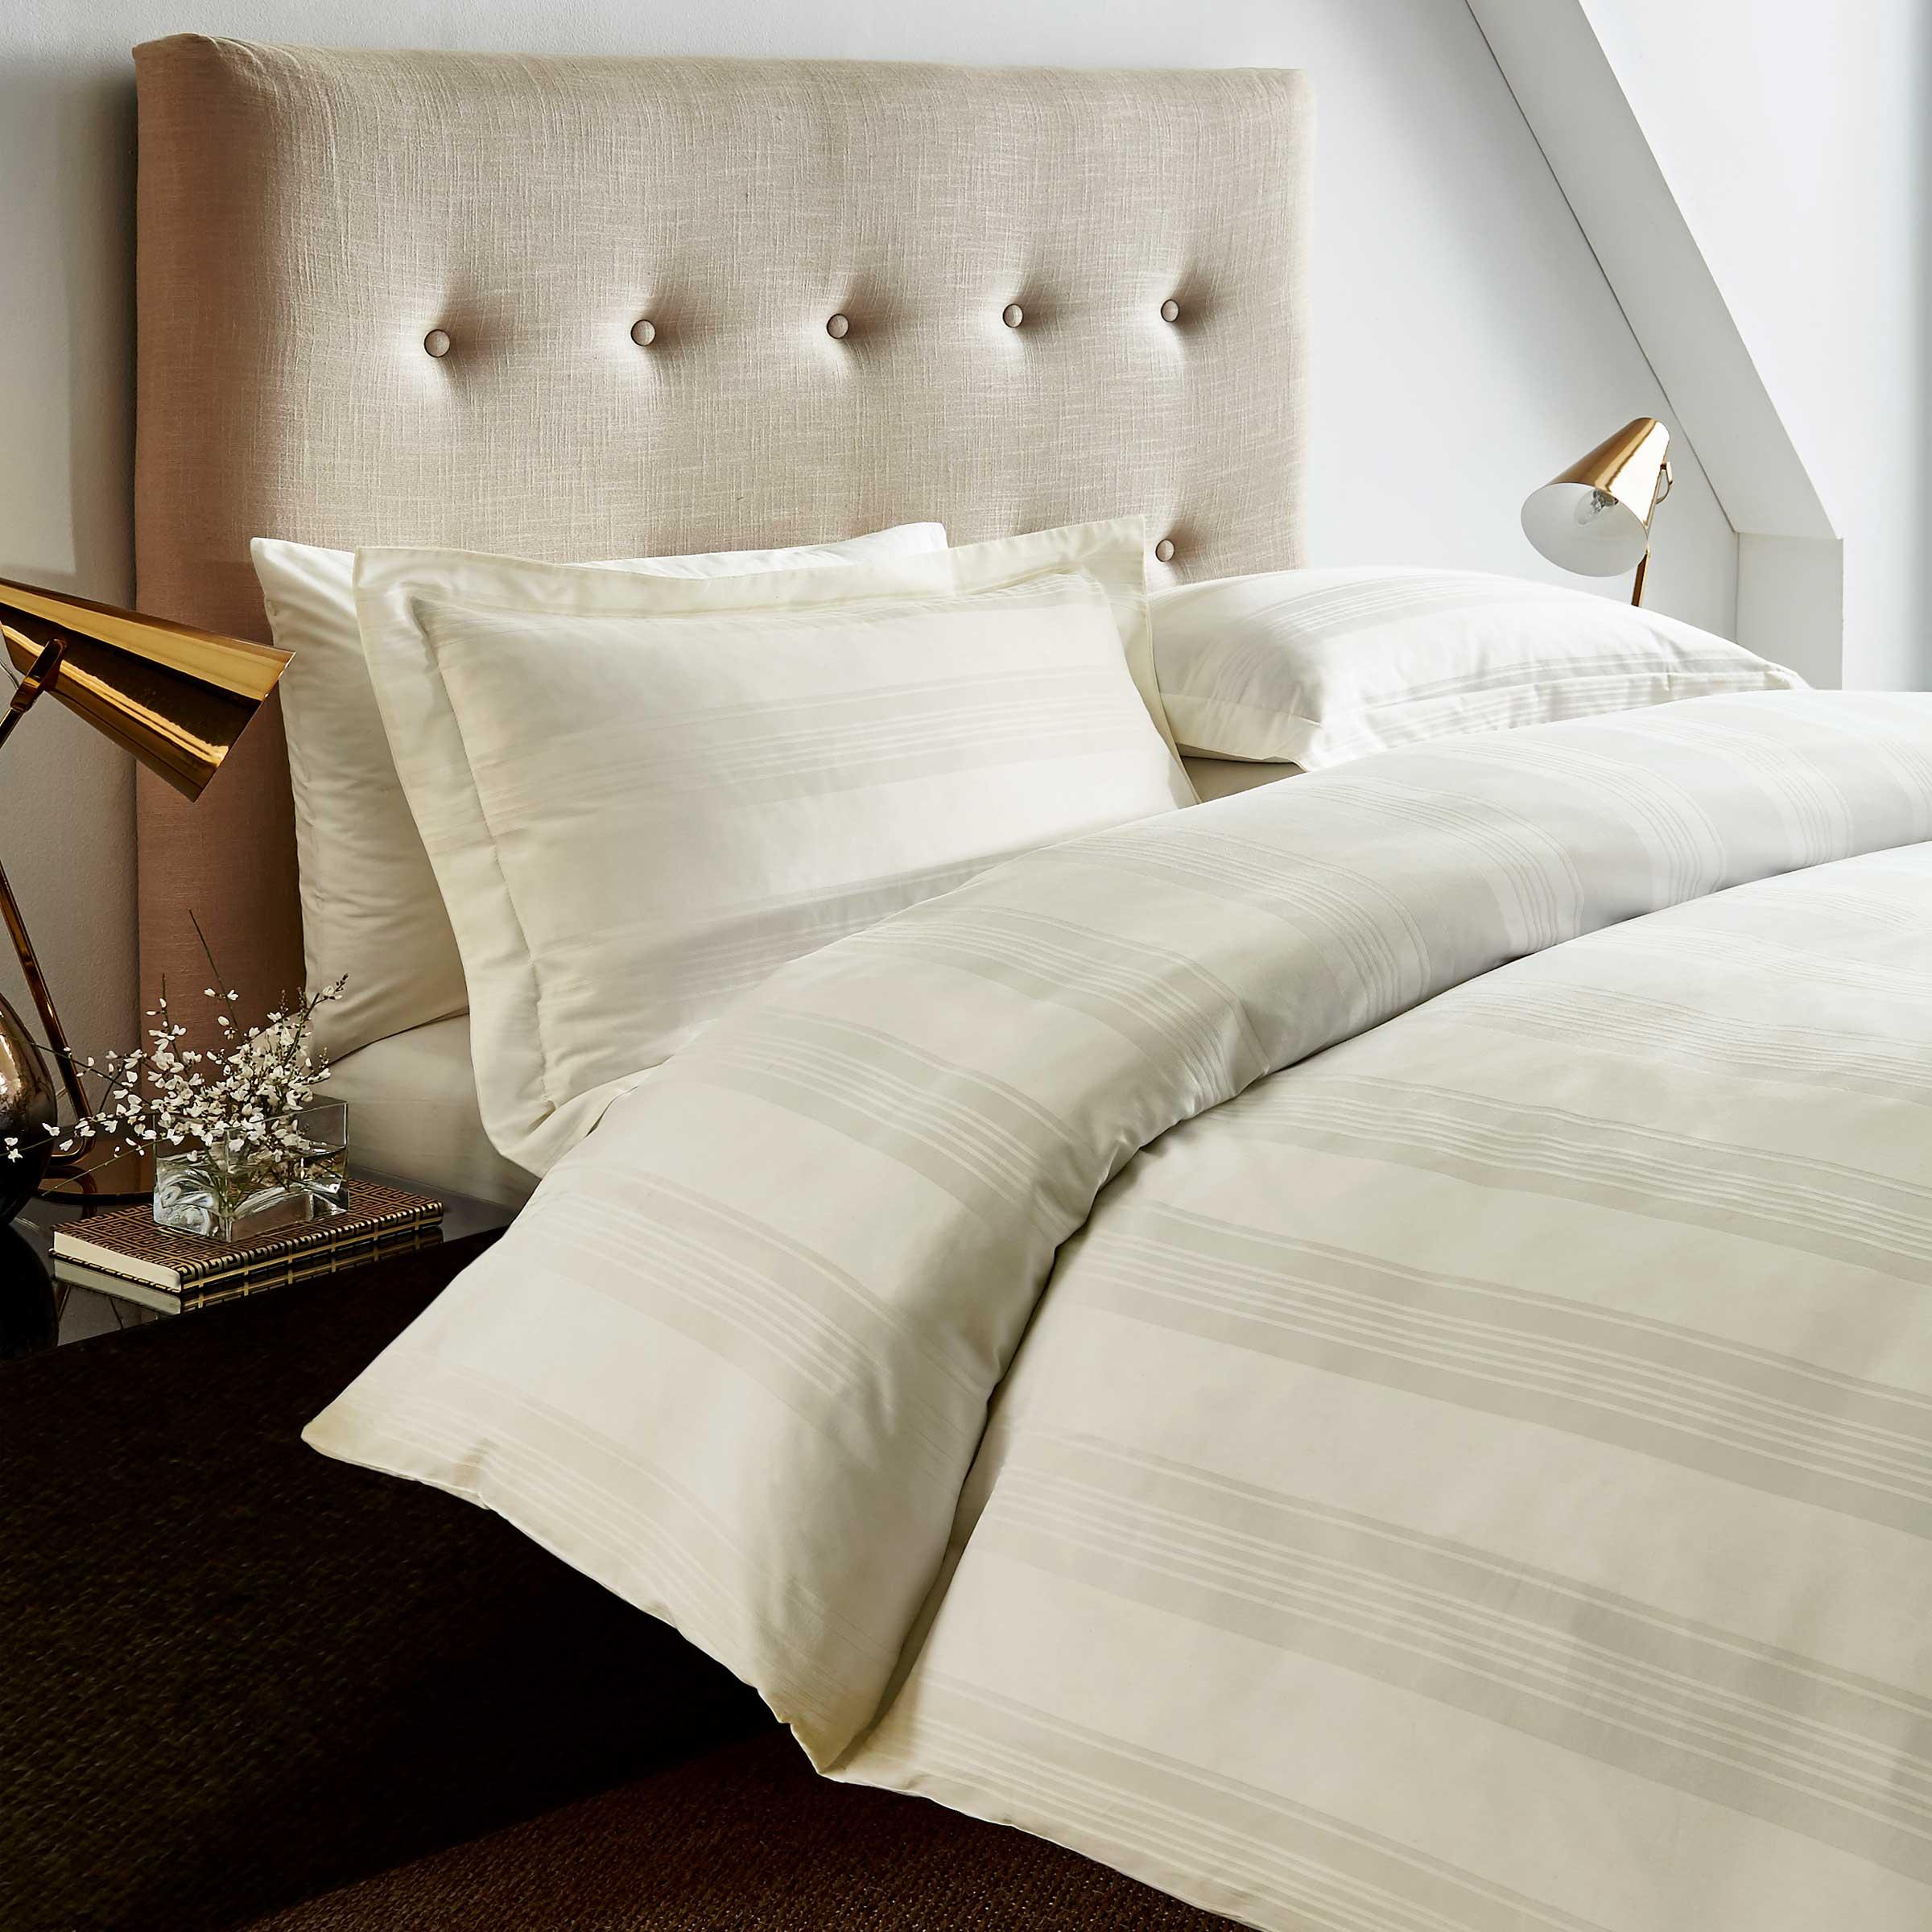 Hotel Bedding Empire Double Duvet Cover Ivory